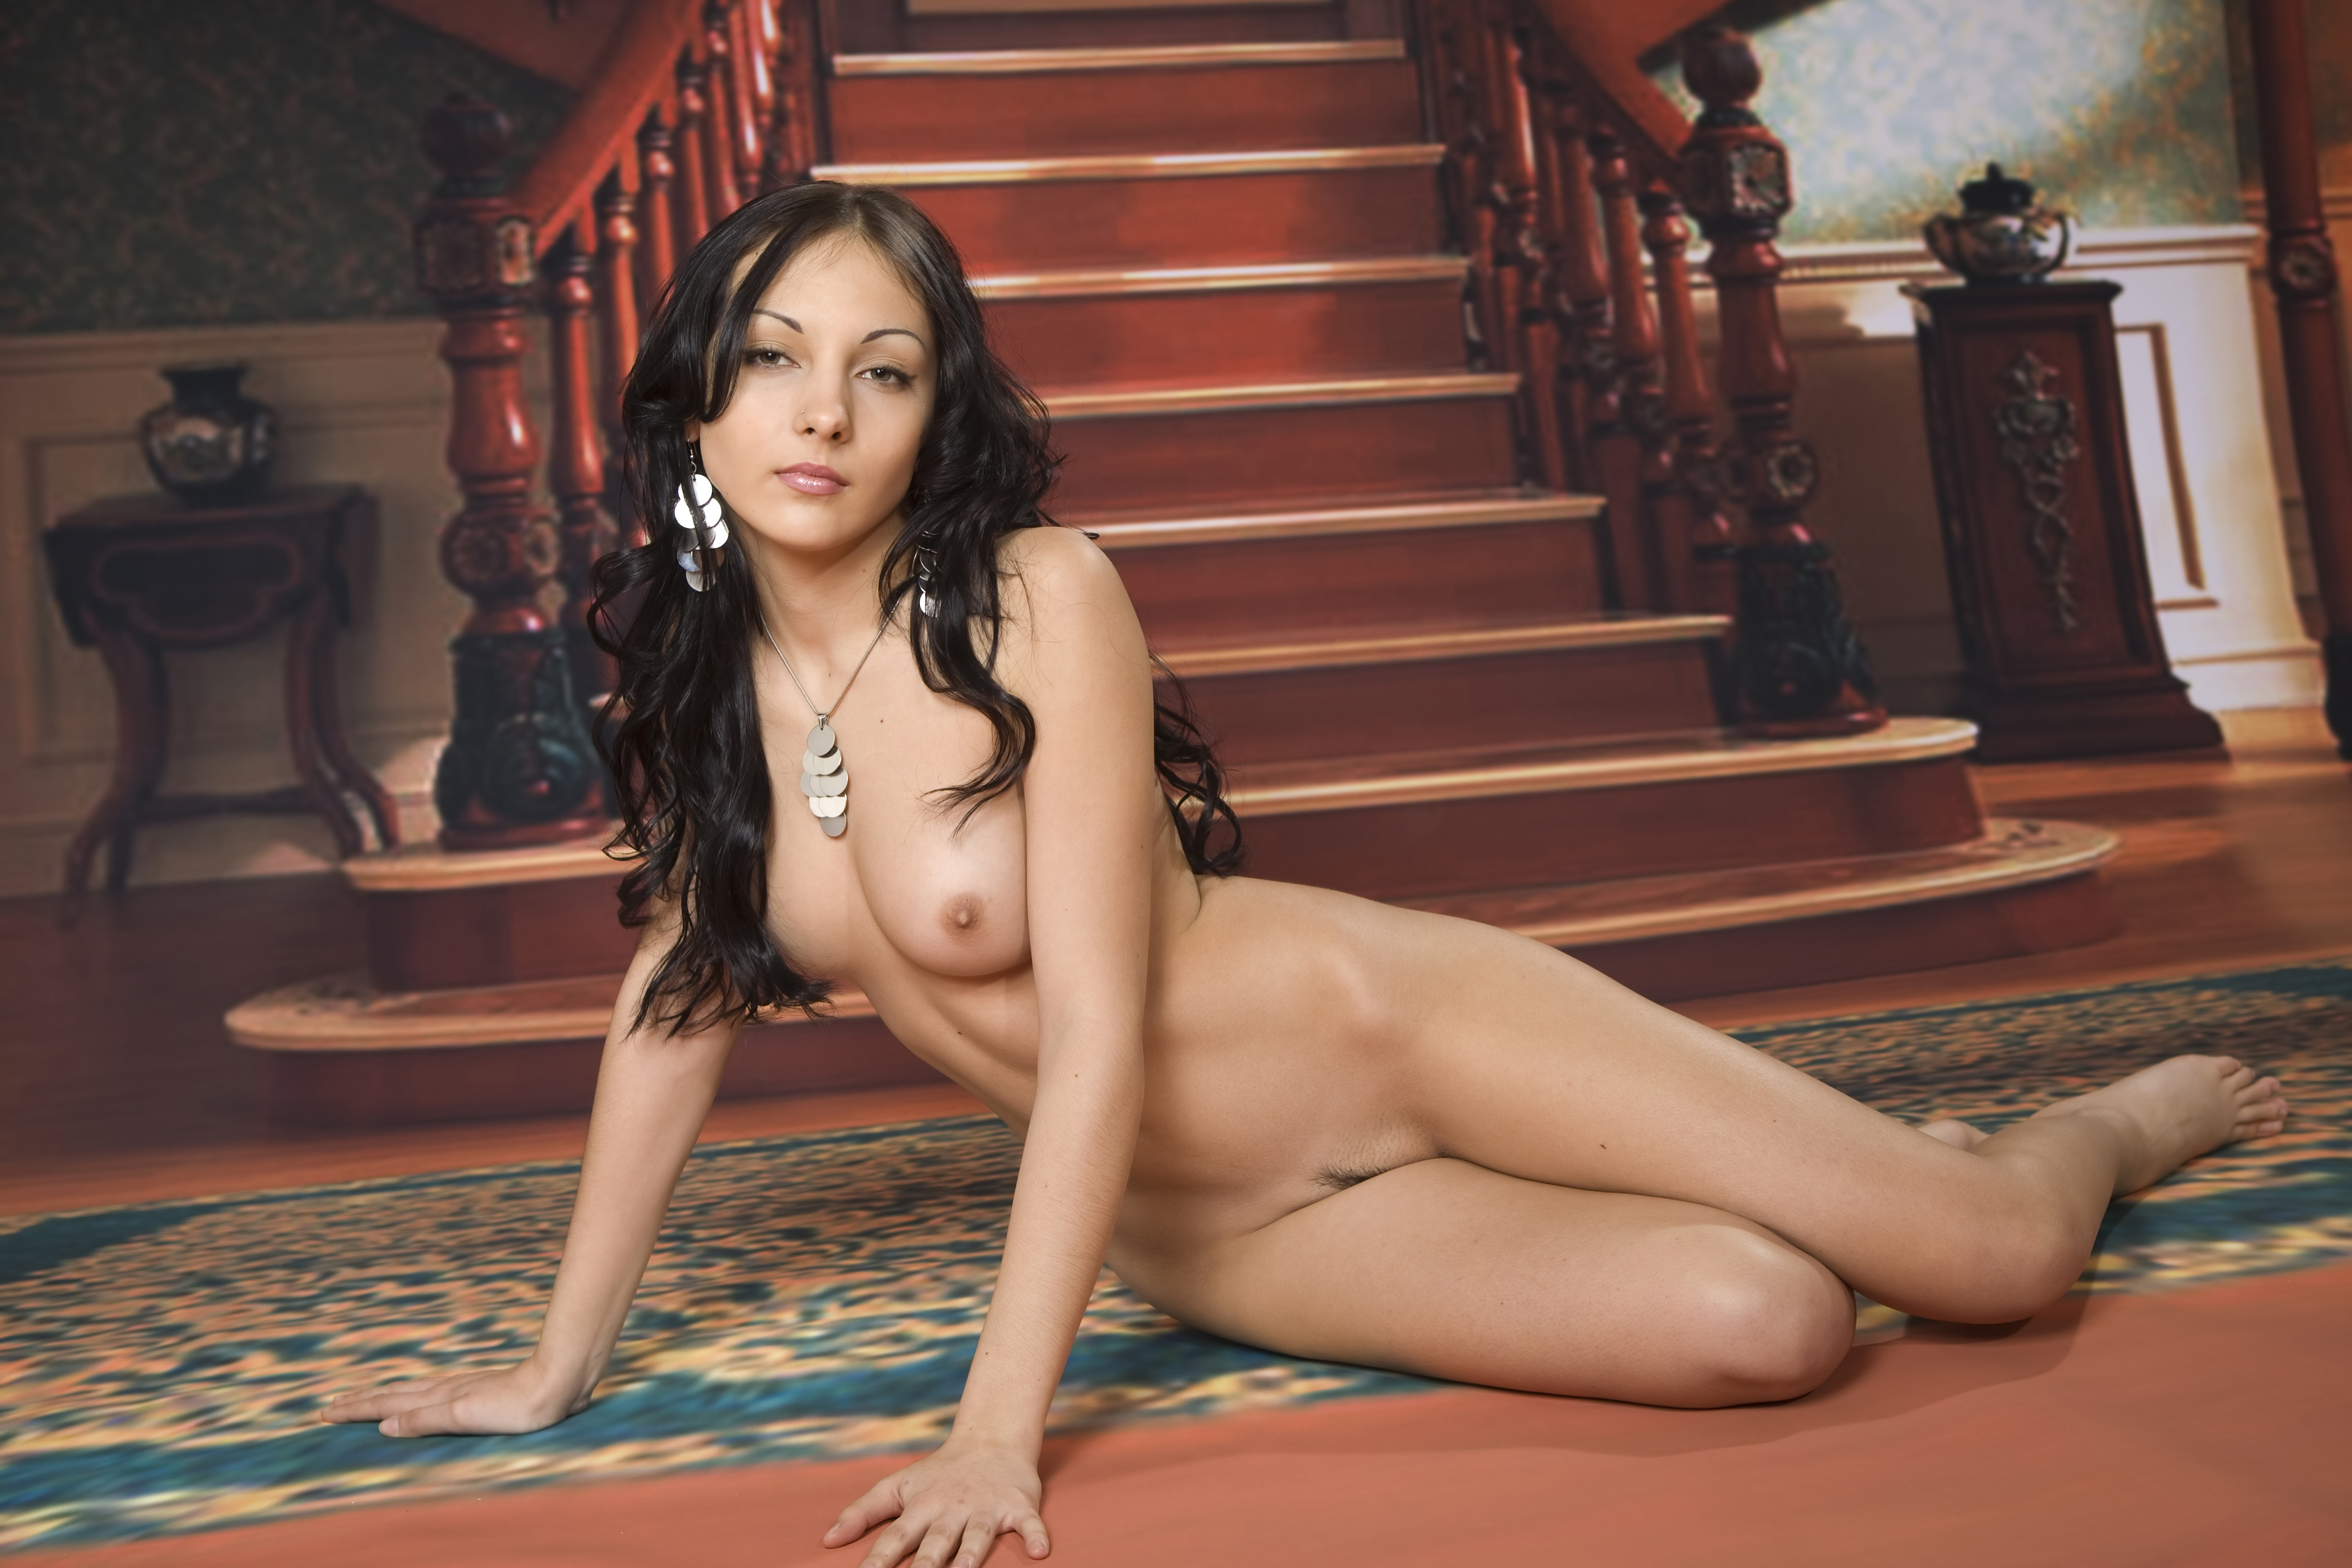 Секс секс фото российских актрис